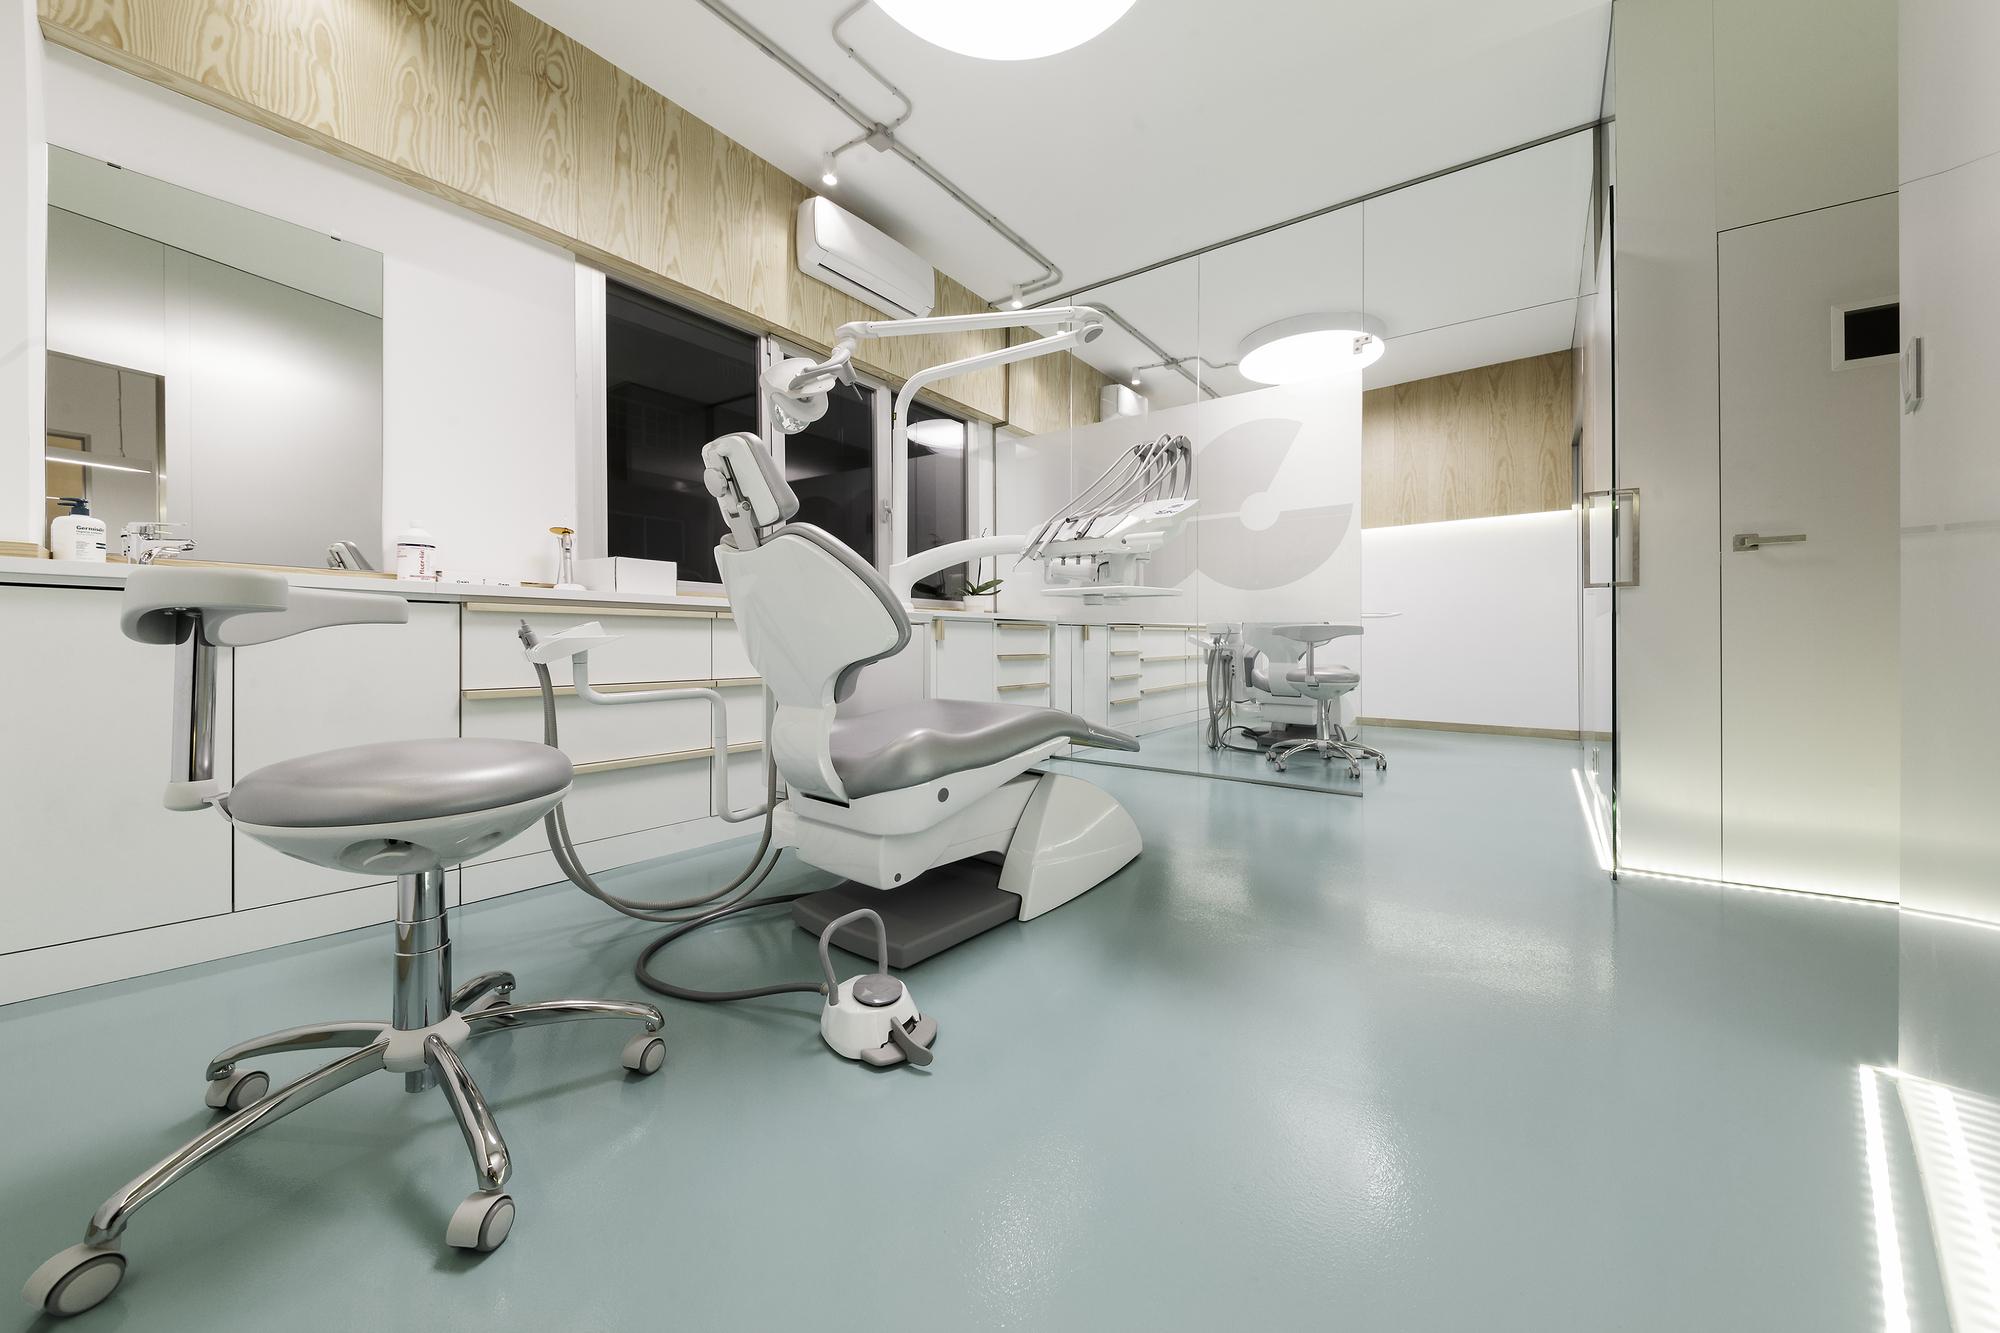 دکوراسیون مطب دندانپزشکی با 23 طراحی شیک